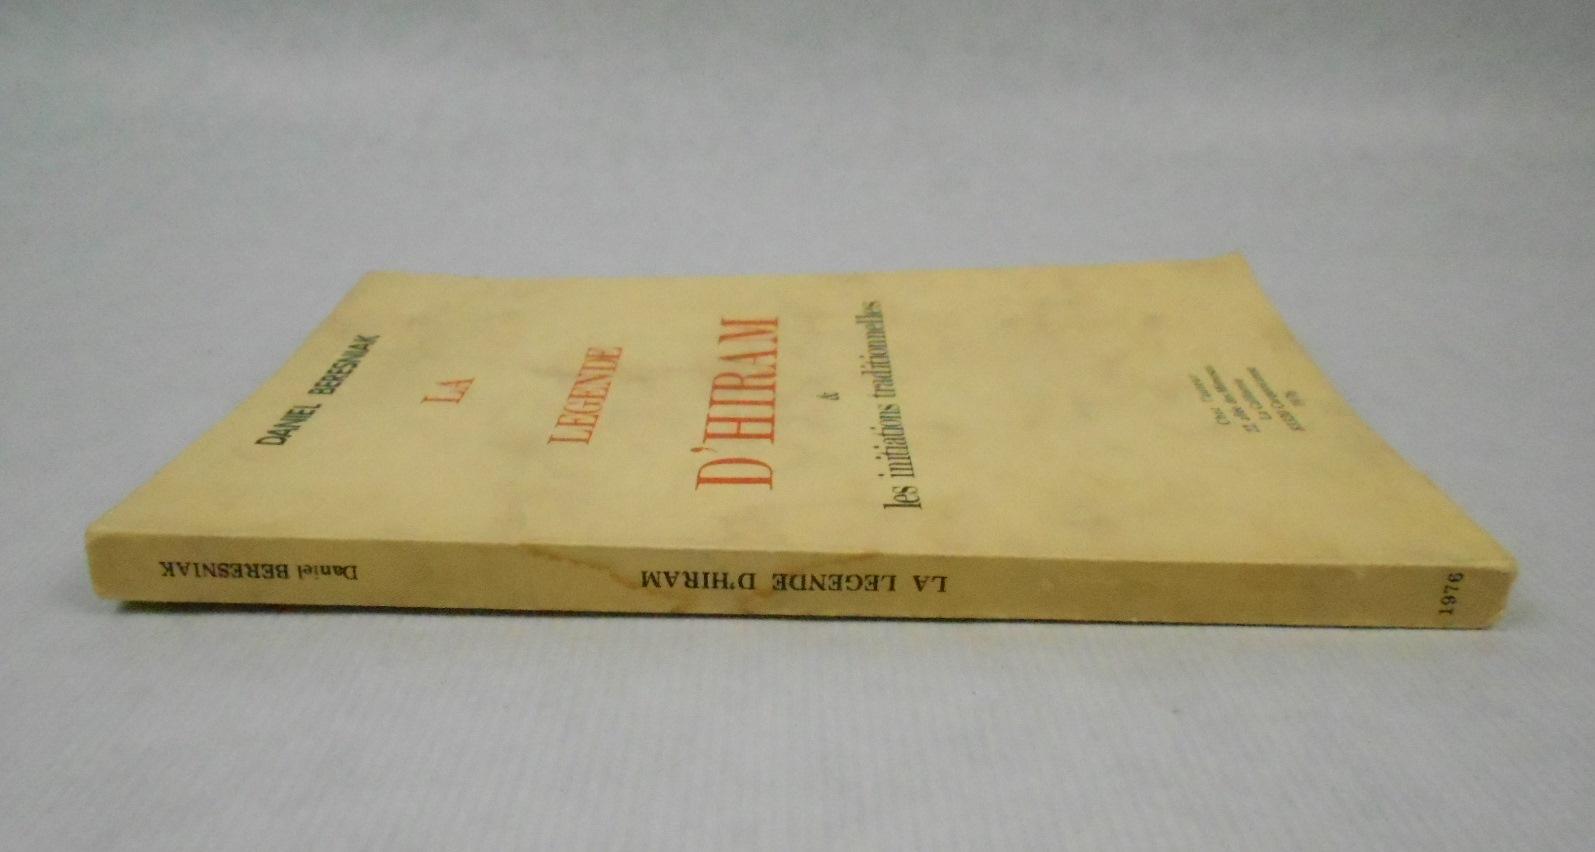 17816_2